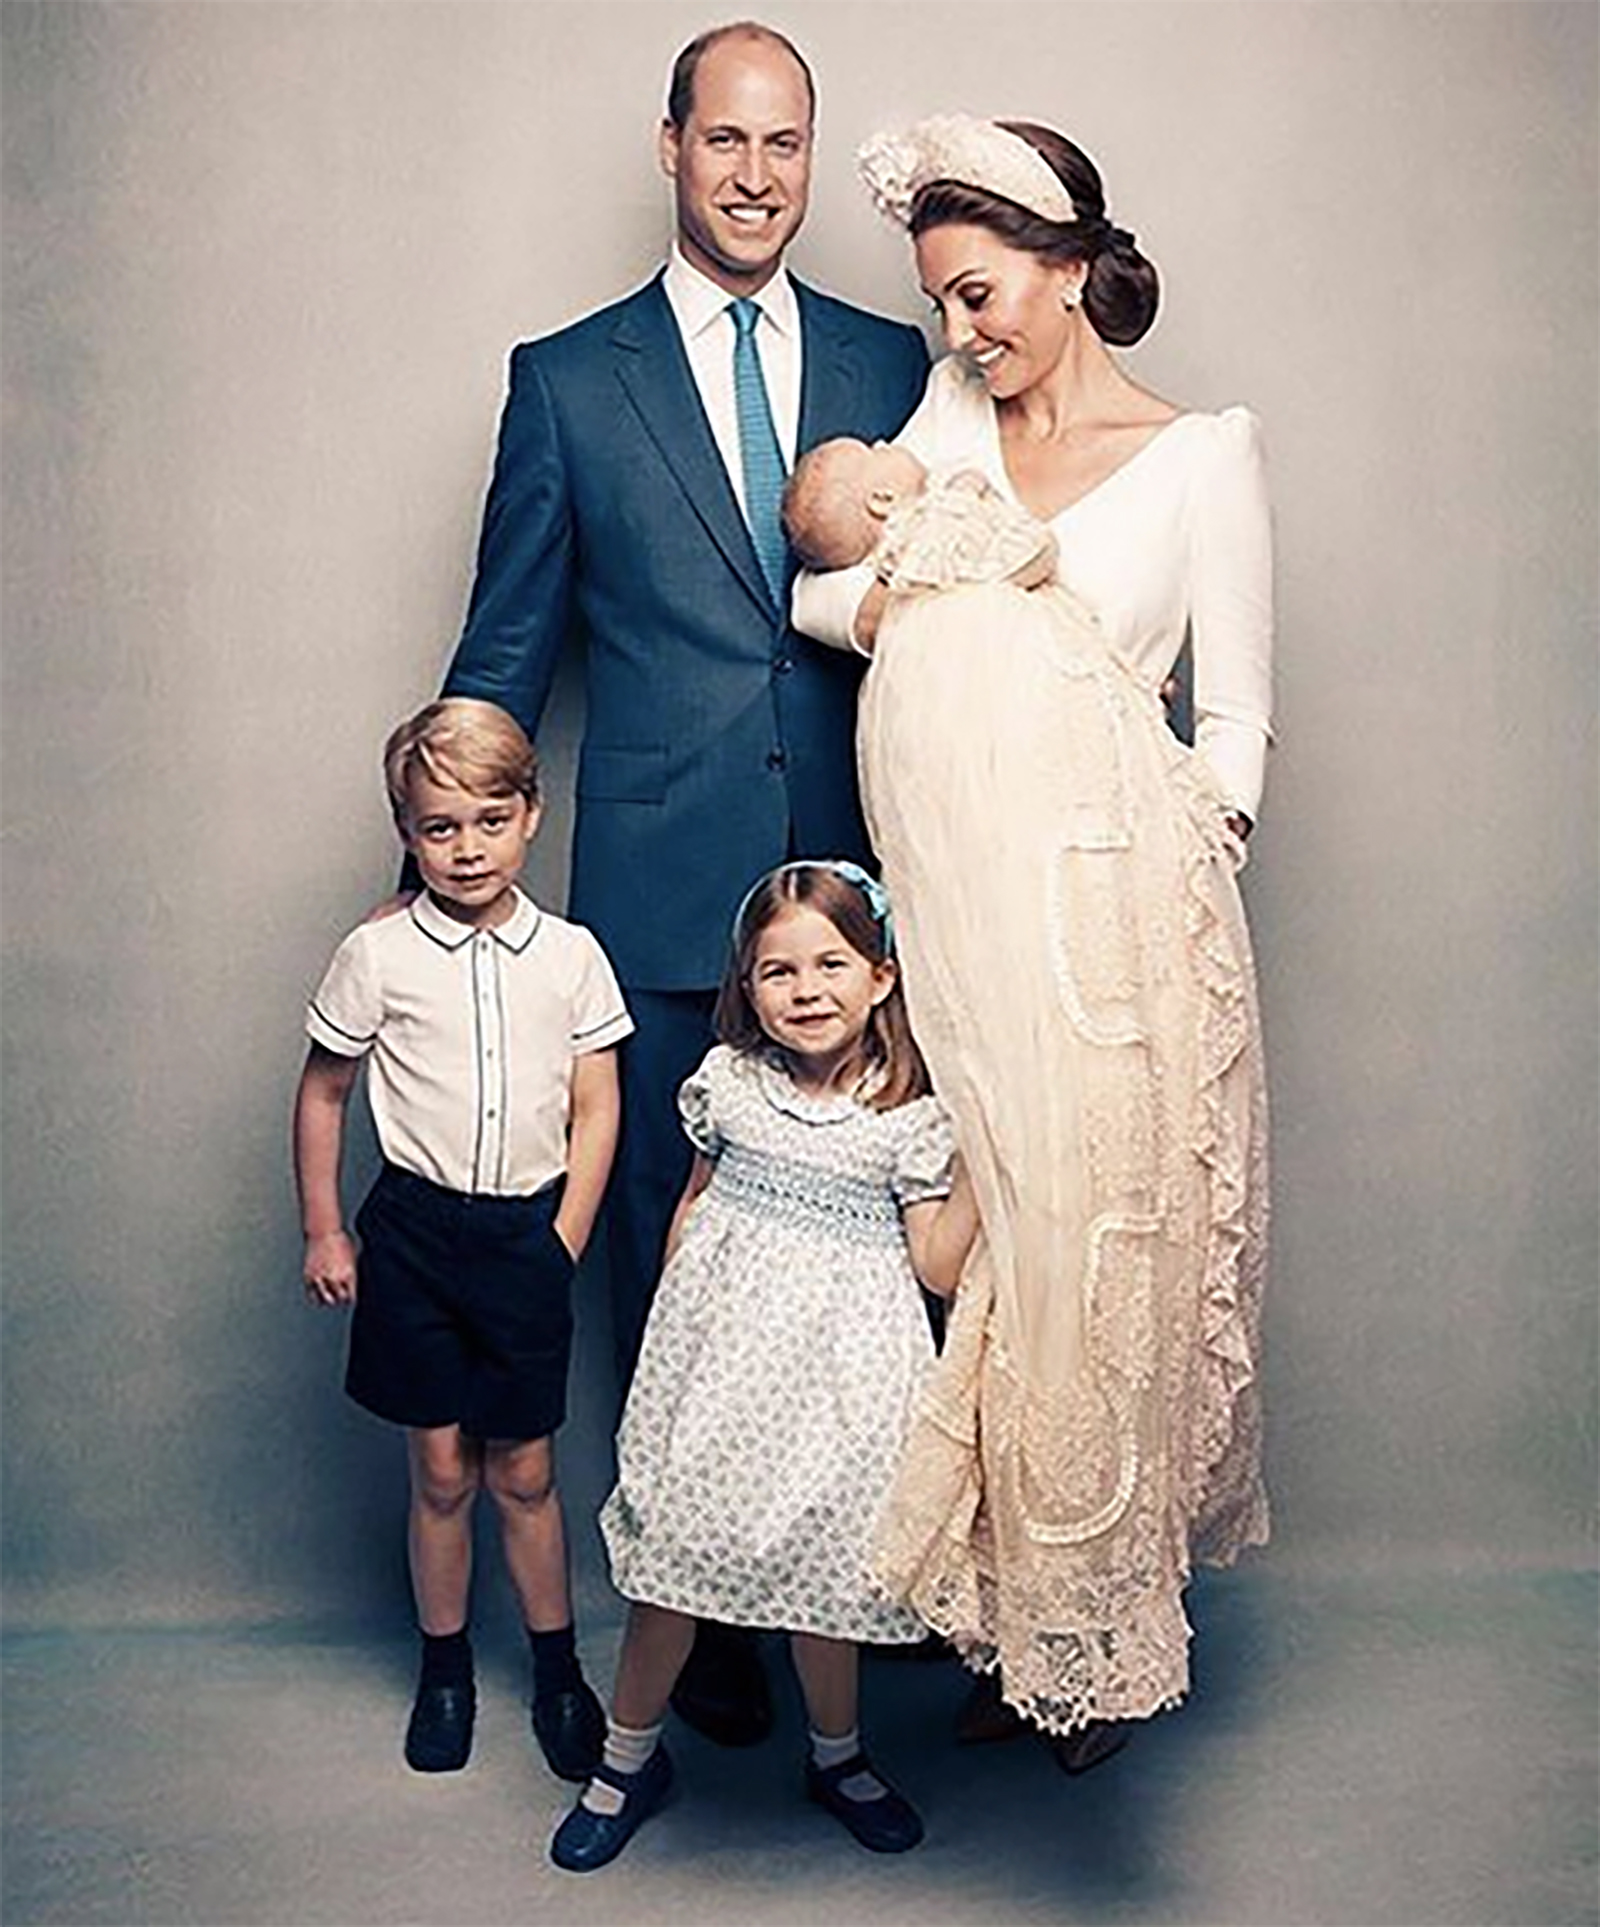 Príncipe George, príncipe William, princesa Kate, Princesa Charlotte, príncipe Louis